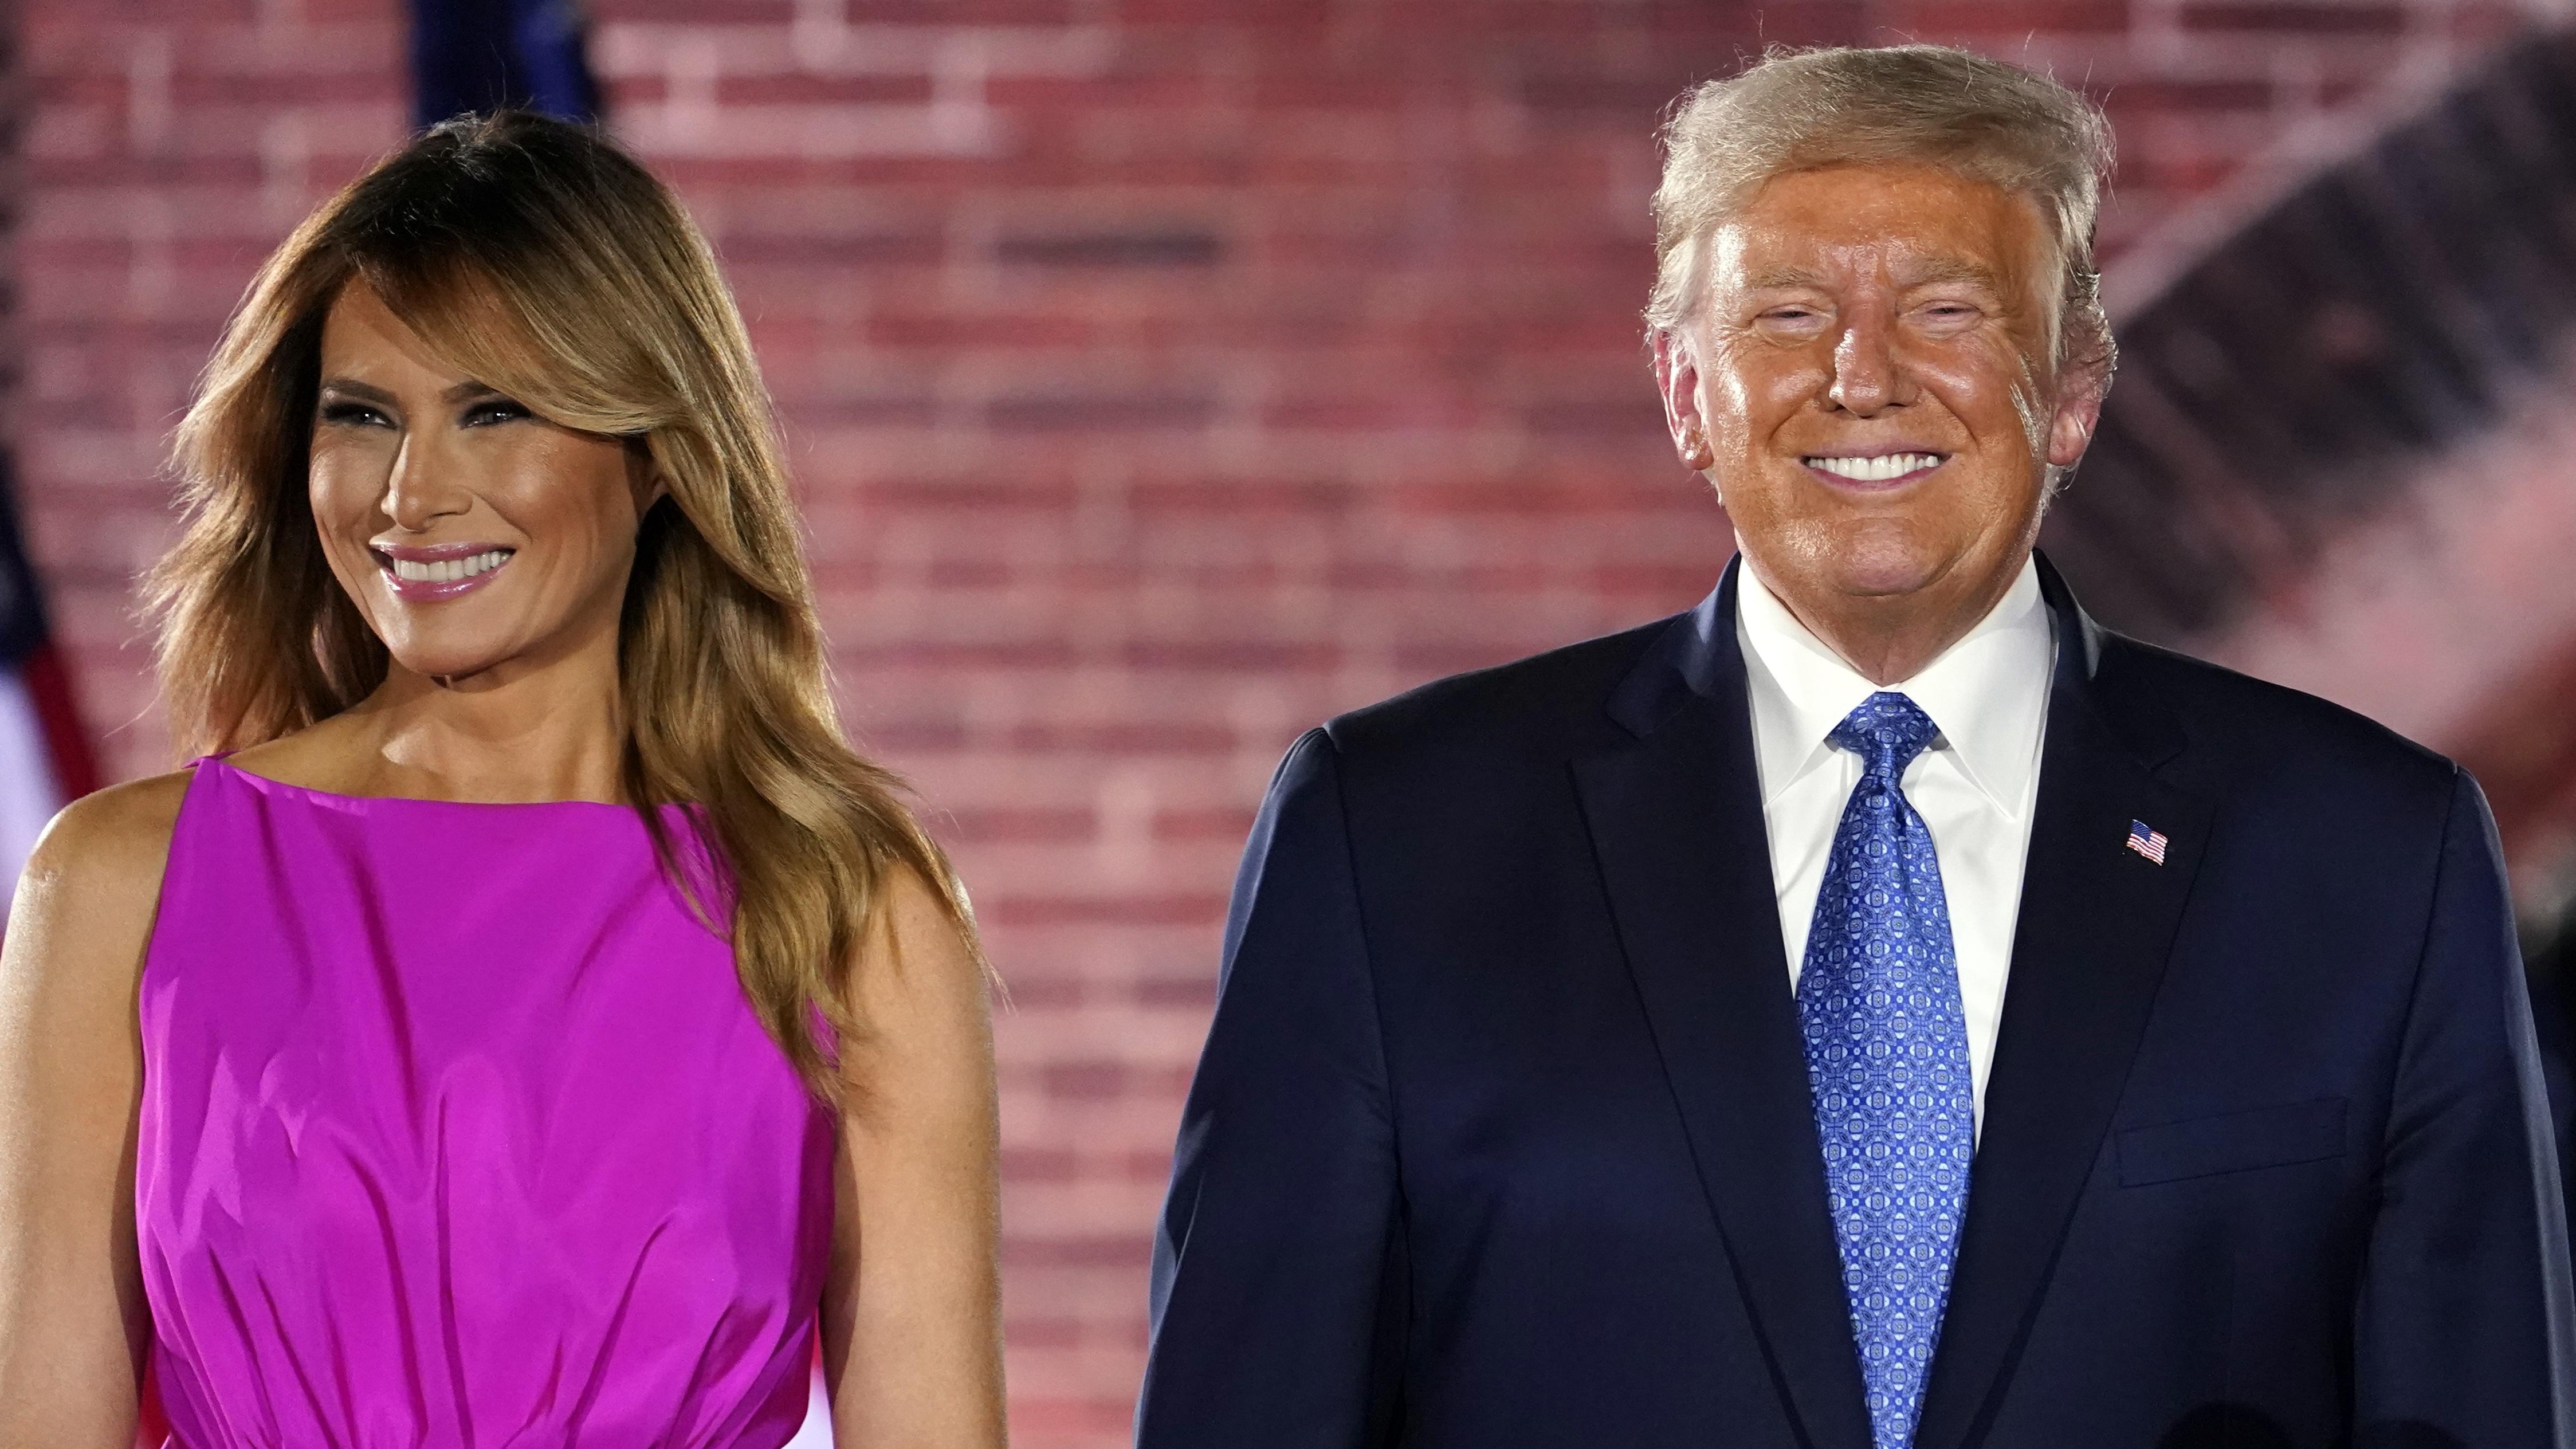 First Lady Melania und POTUS Donald Trump